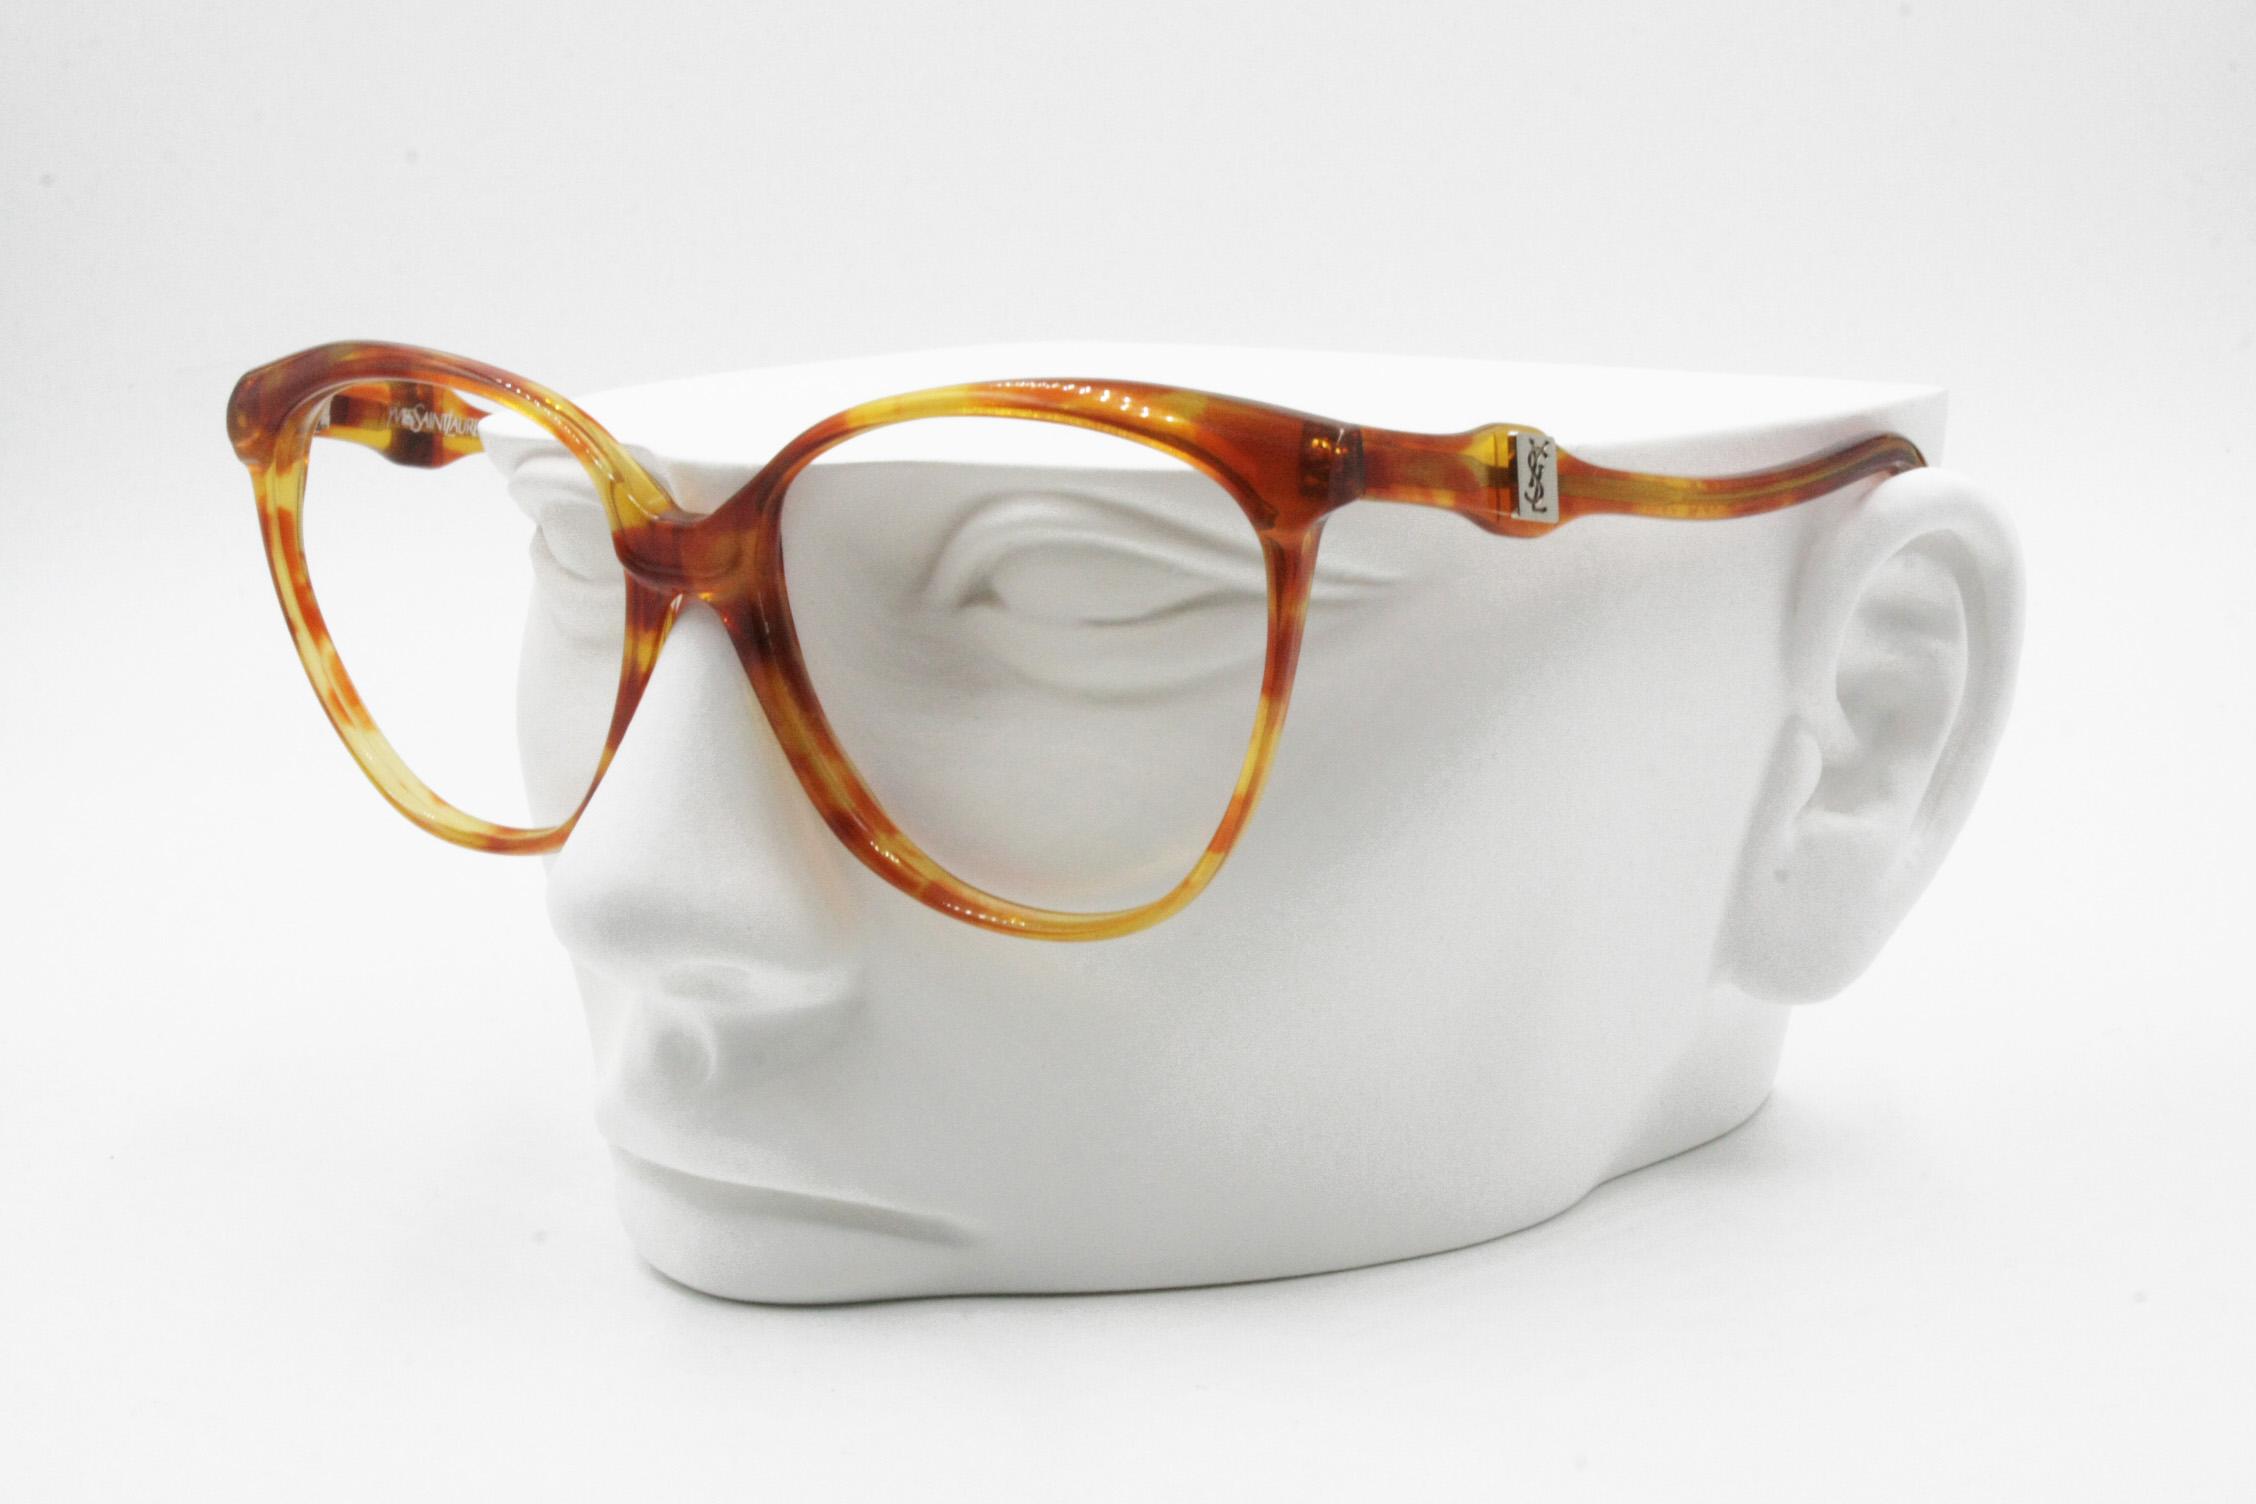 70f3aad7f6 Vintage Yves saint Laurent YSL vintage acetate glasses frame blondie e  brown caramel